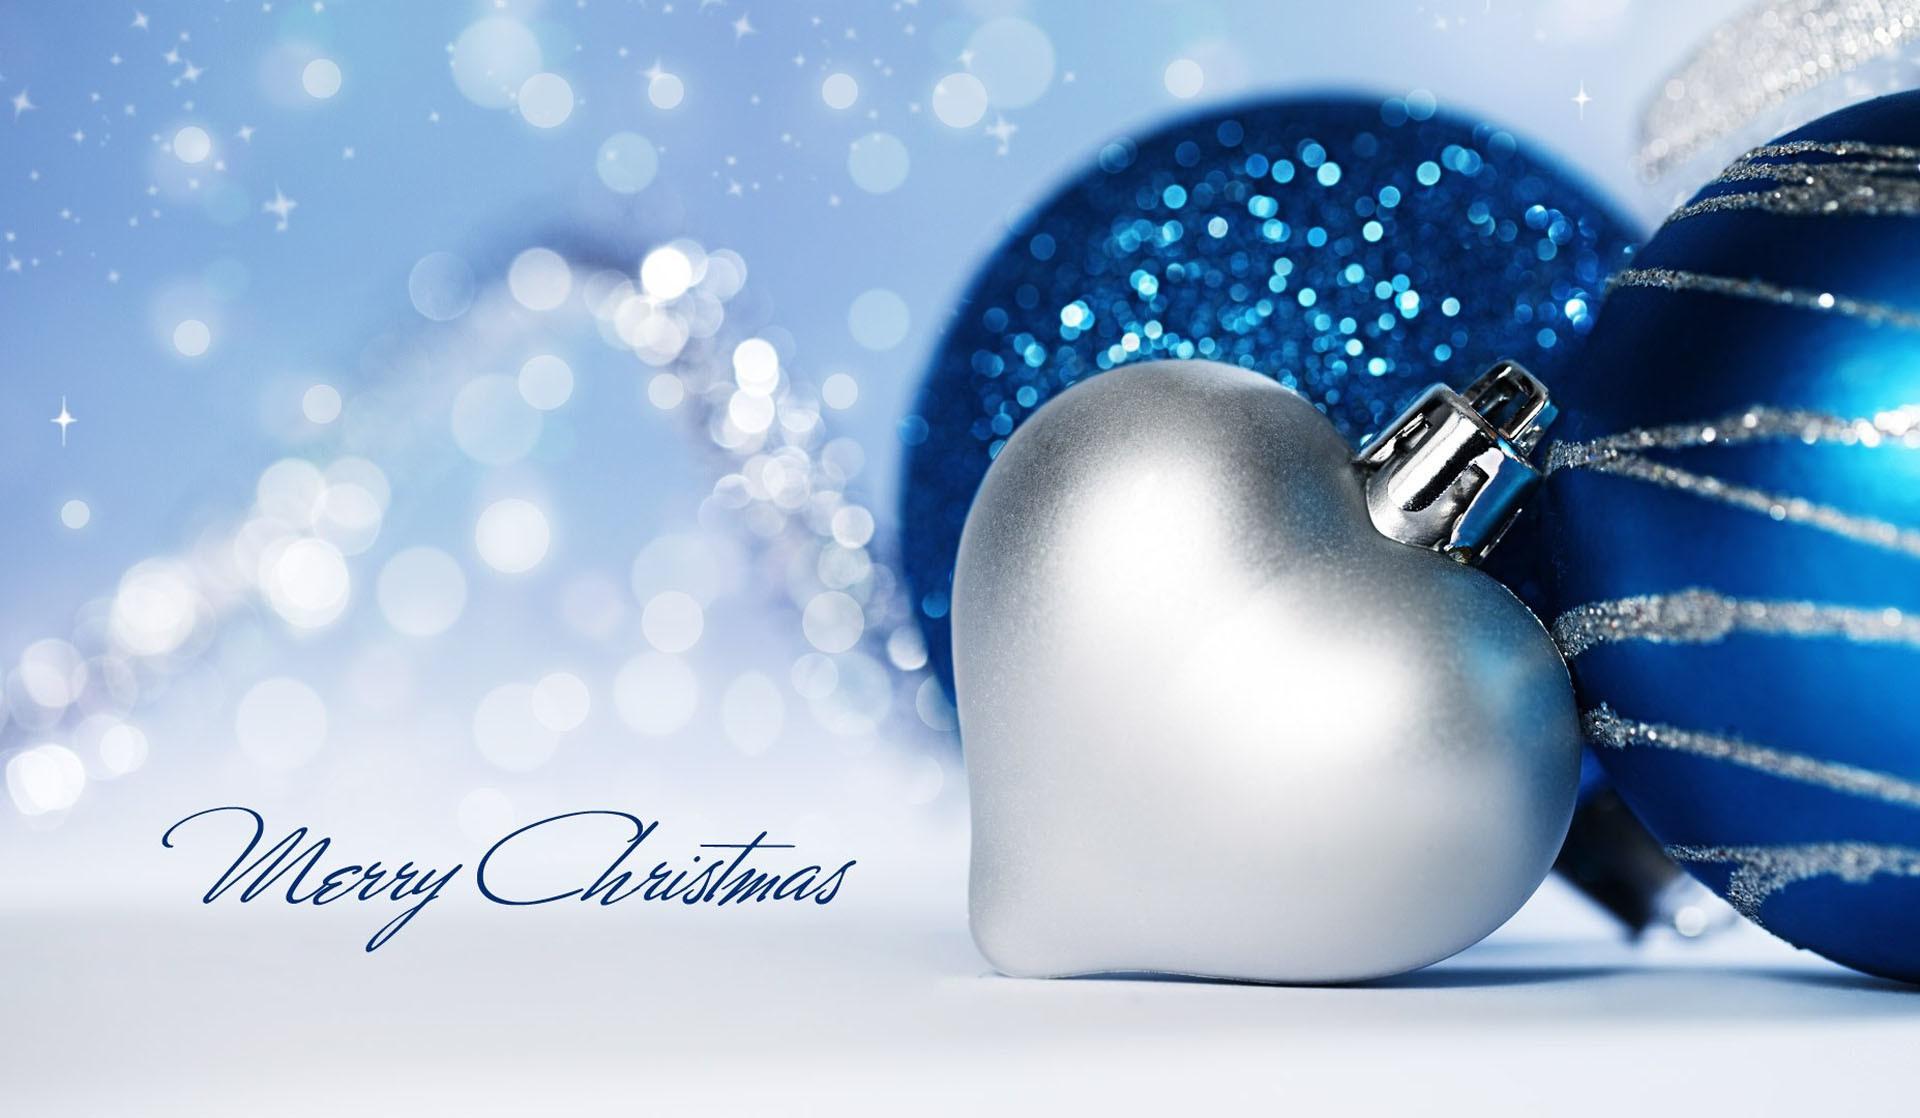 Christmas Heart Beautiful HD Wallpaper for Desktop – Daily .